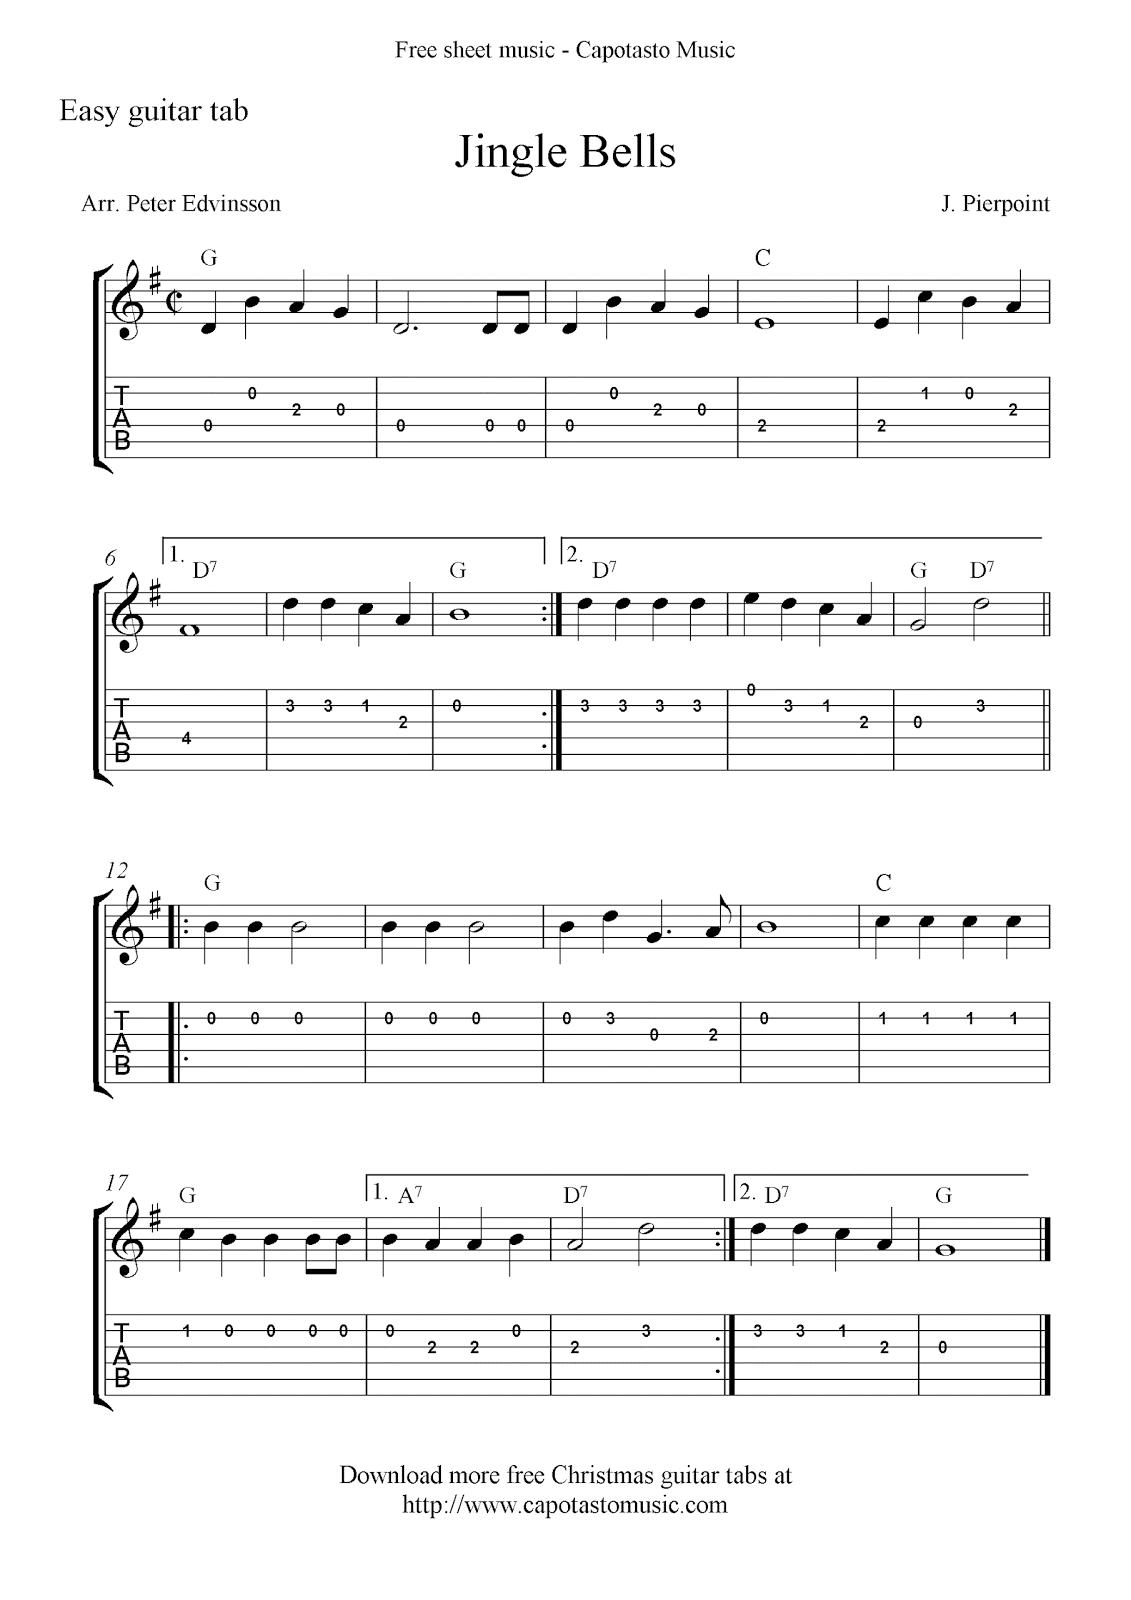 Jingle Bells Free Christmas Guitar Tabs And Sheet Music